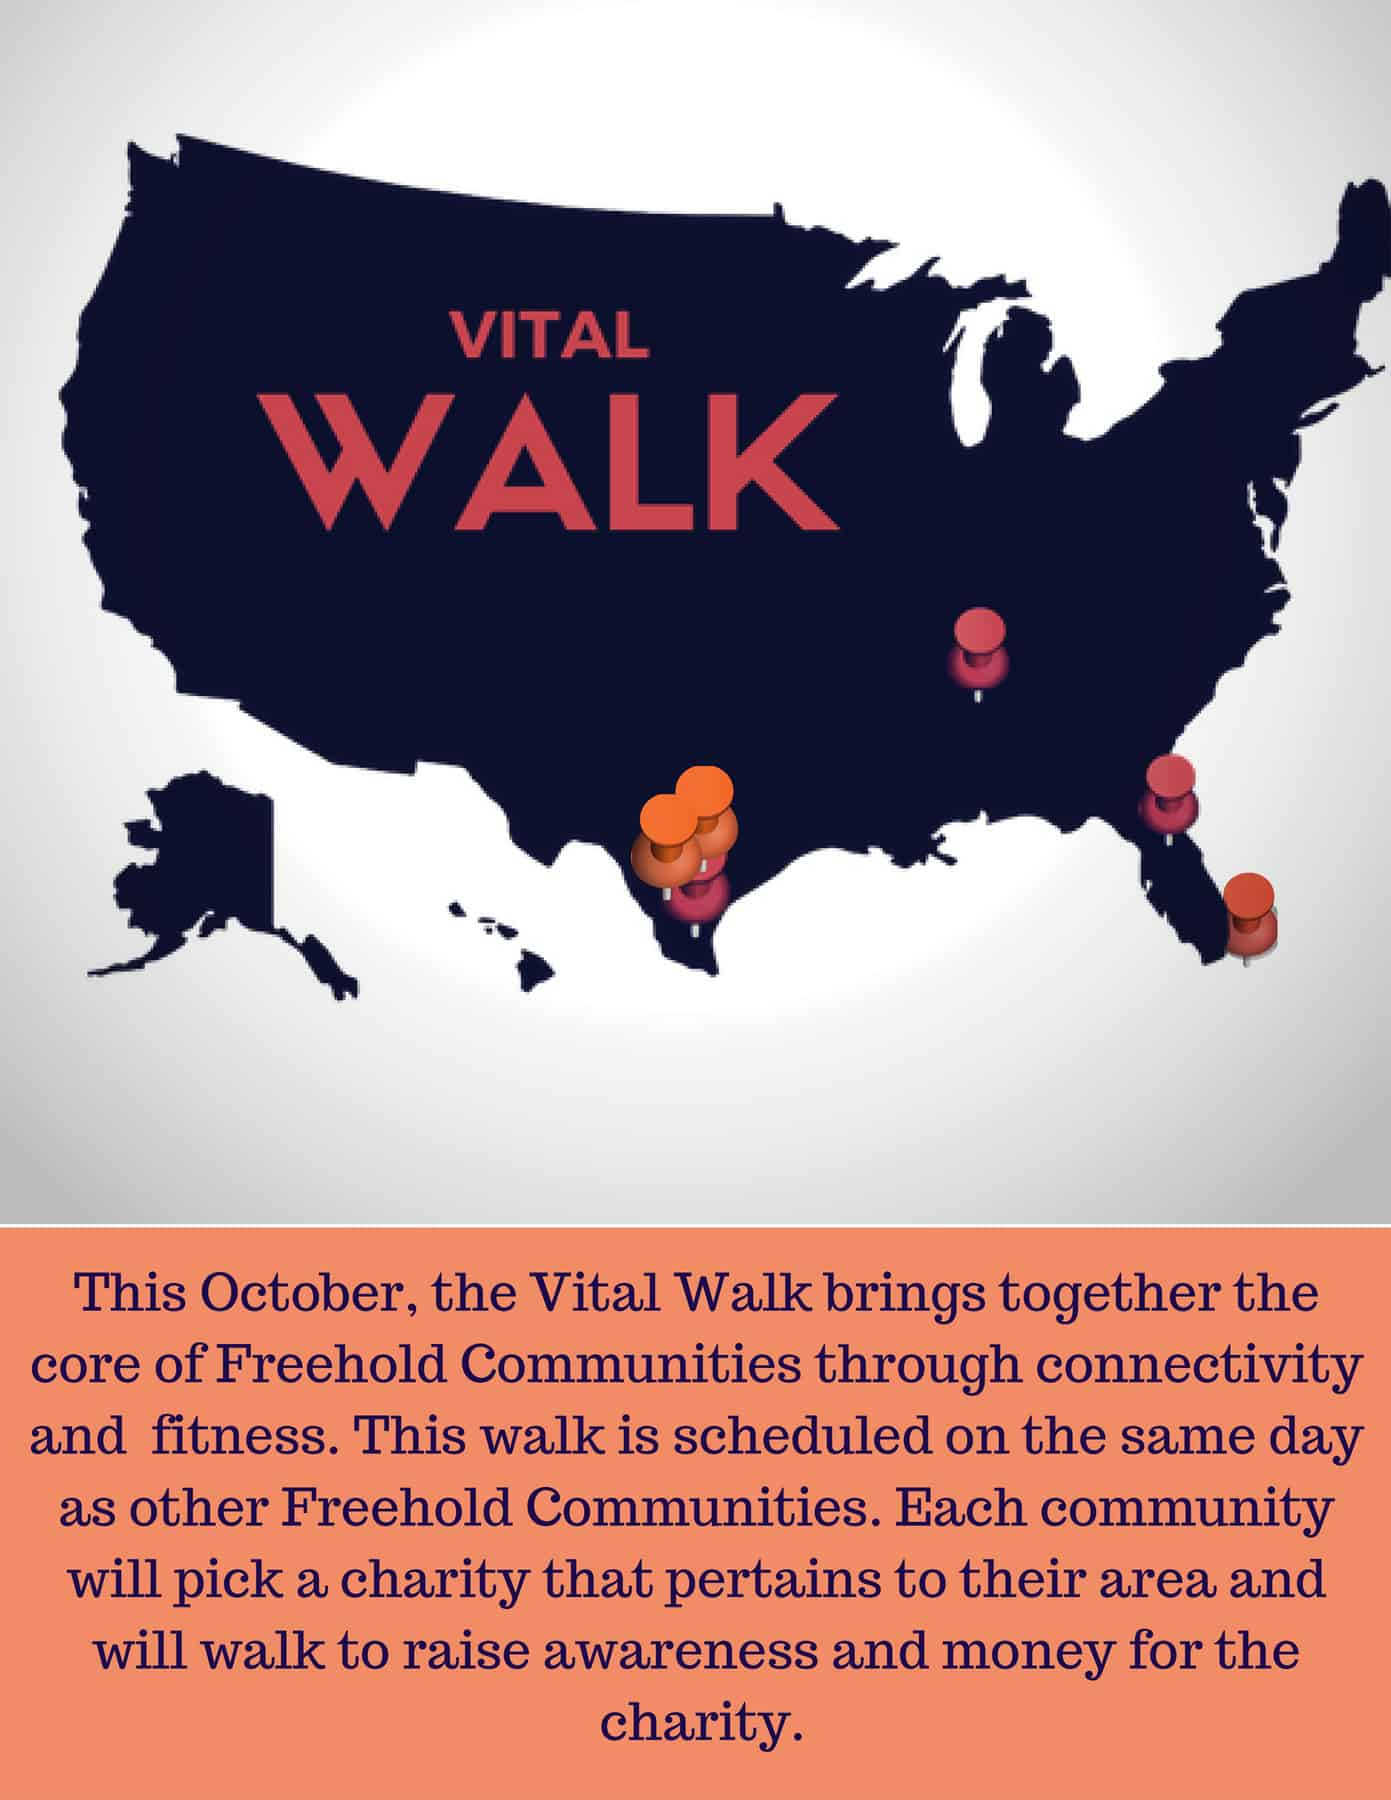 Vital Walk